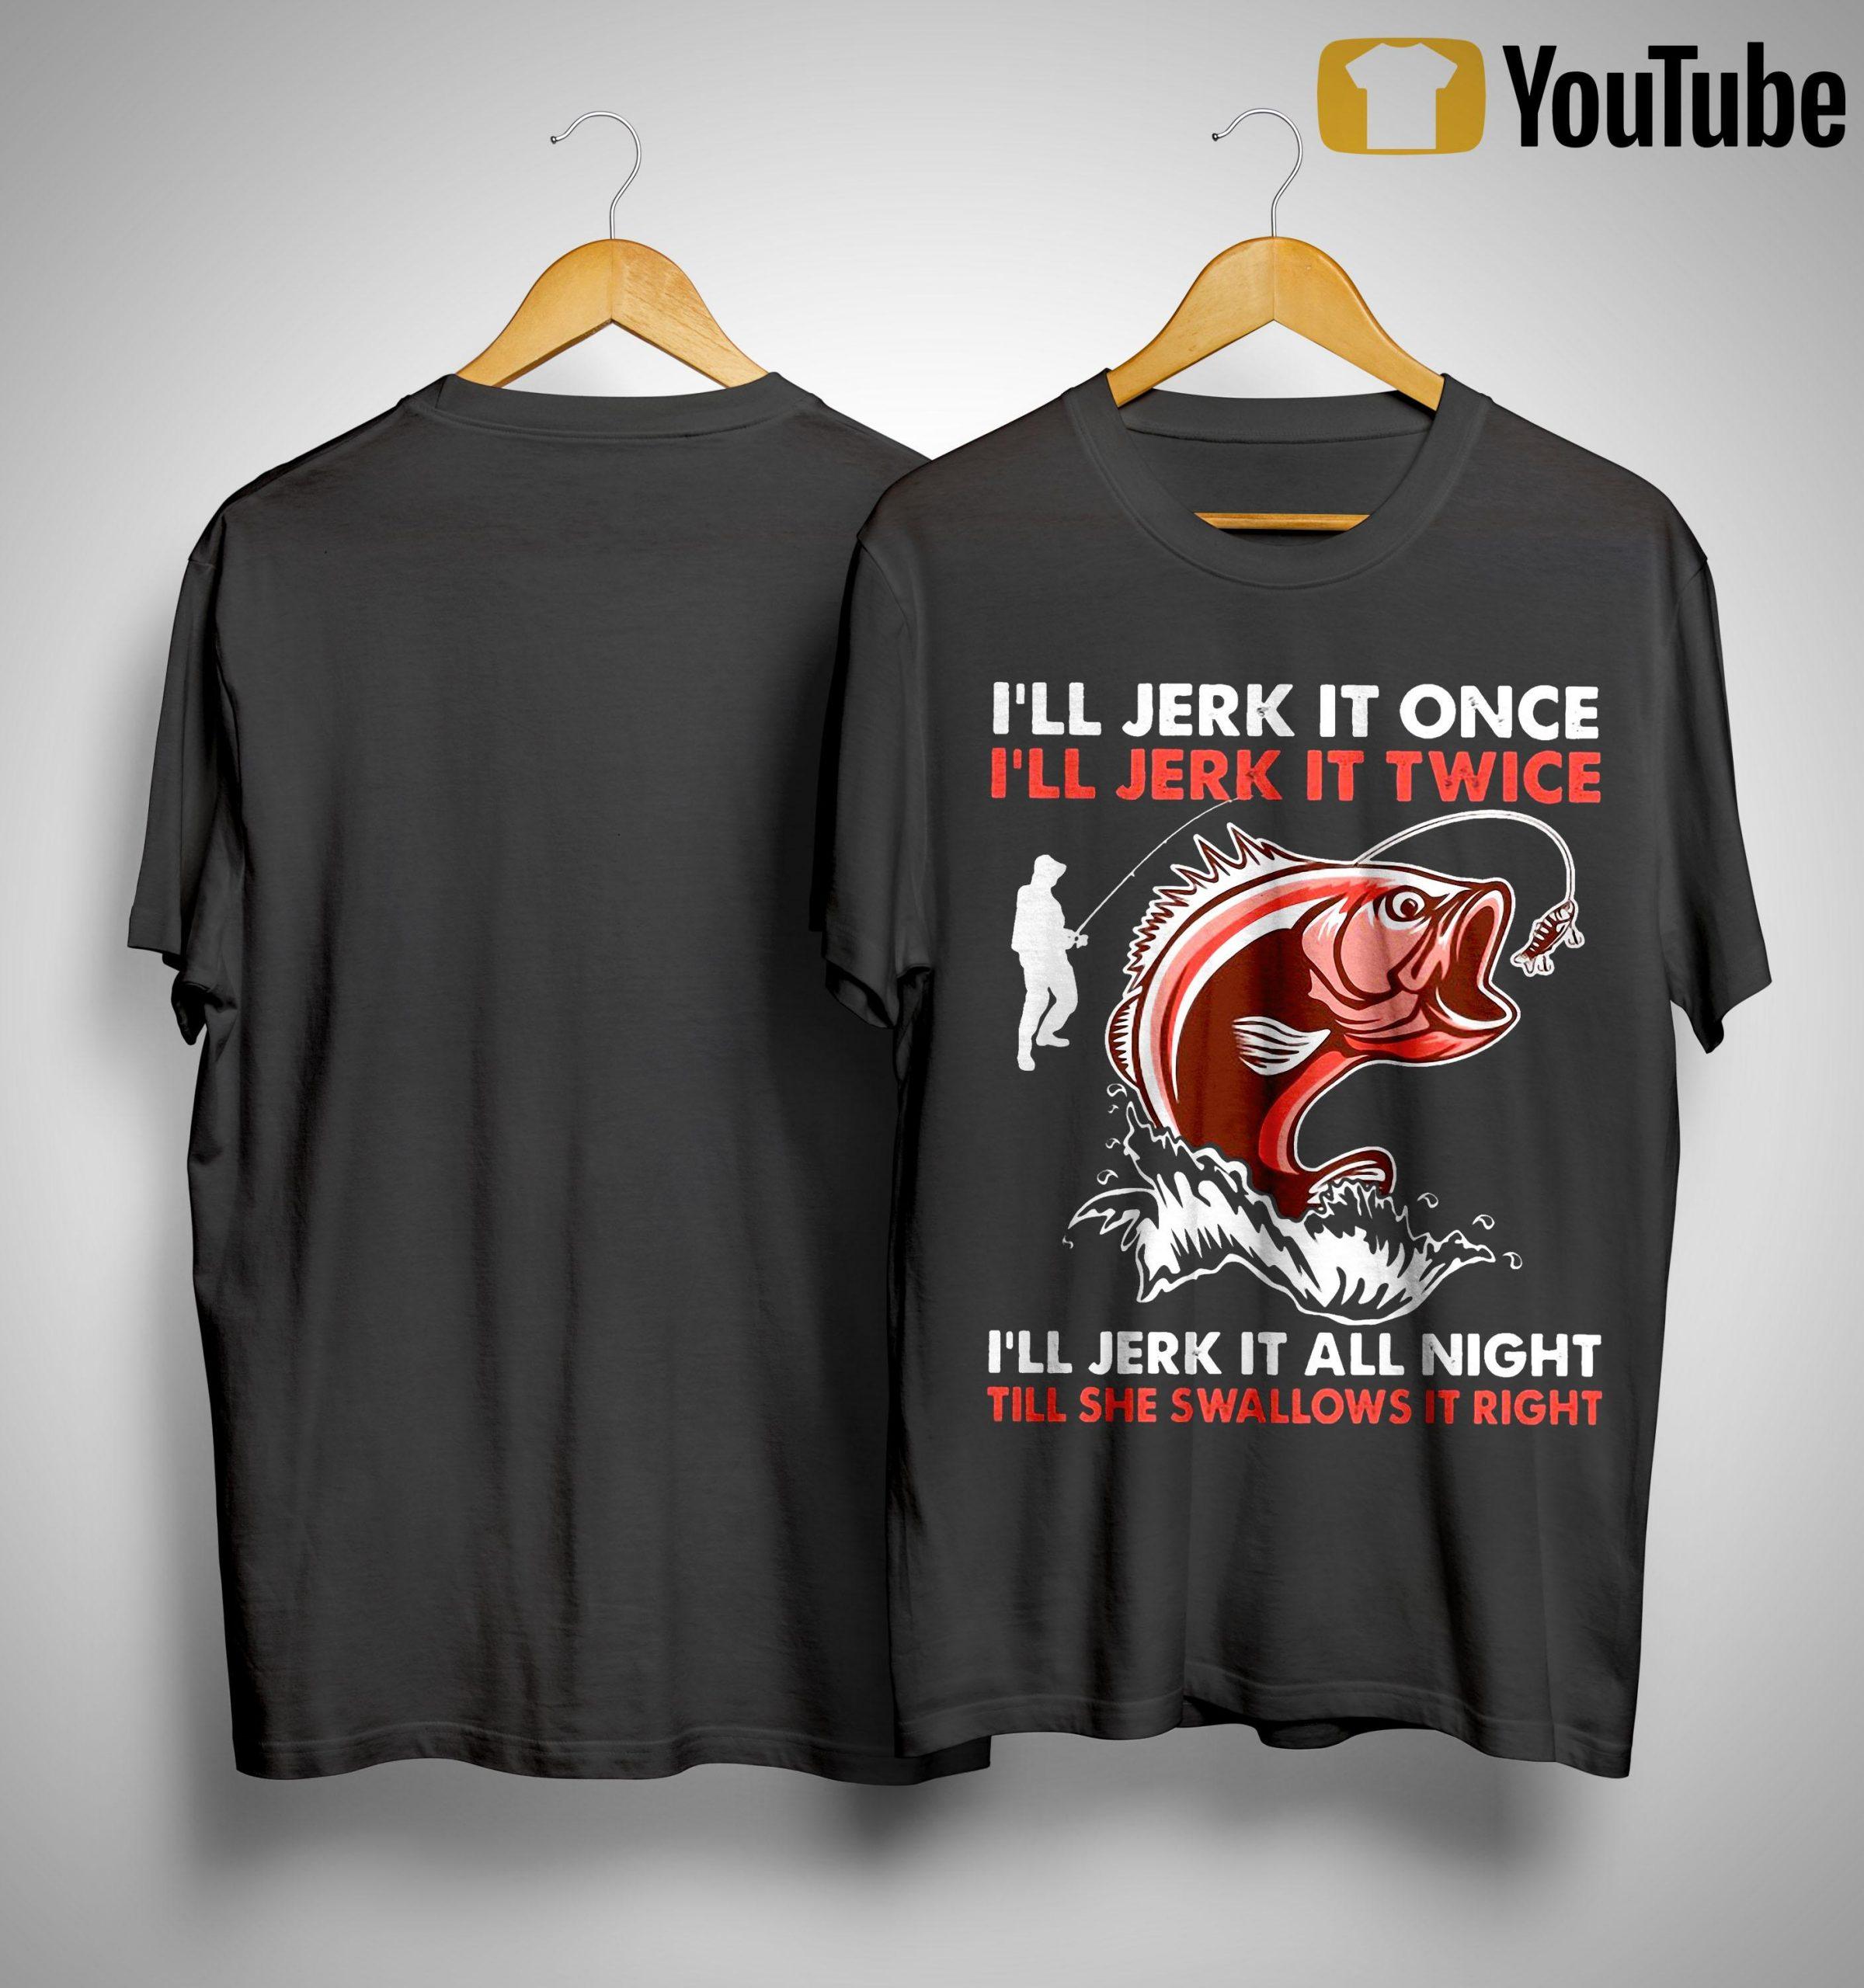 I'll Jerk It Once I'll Jerk It Twice I'll Jerk It All Night Shirt